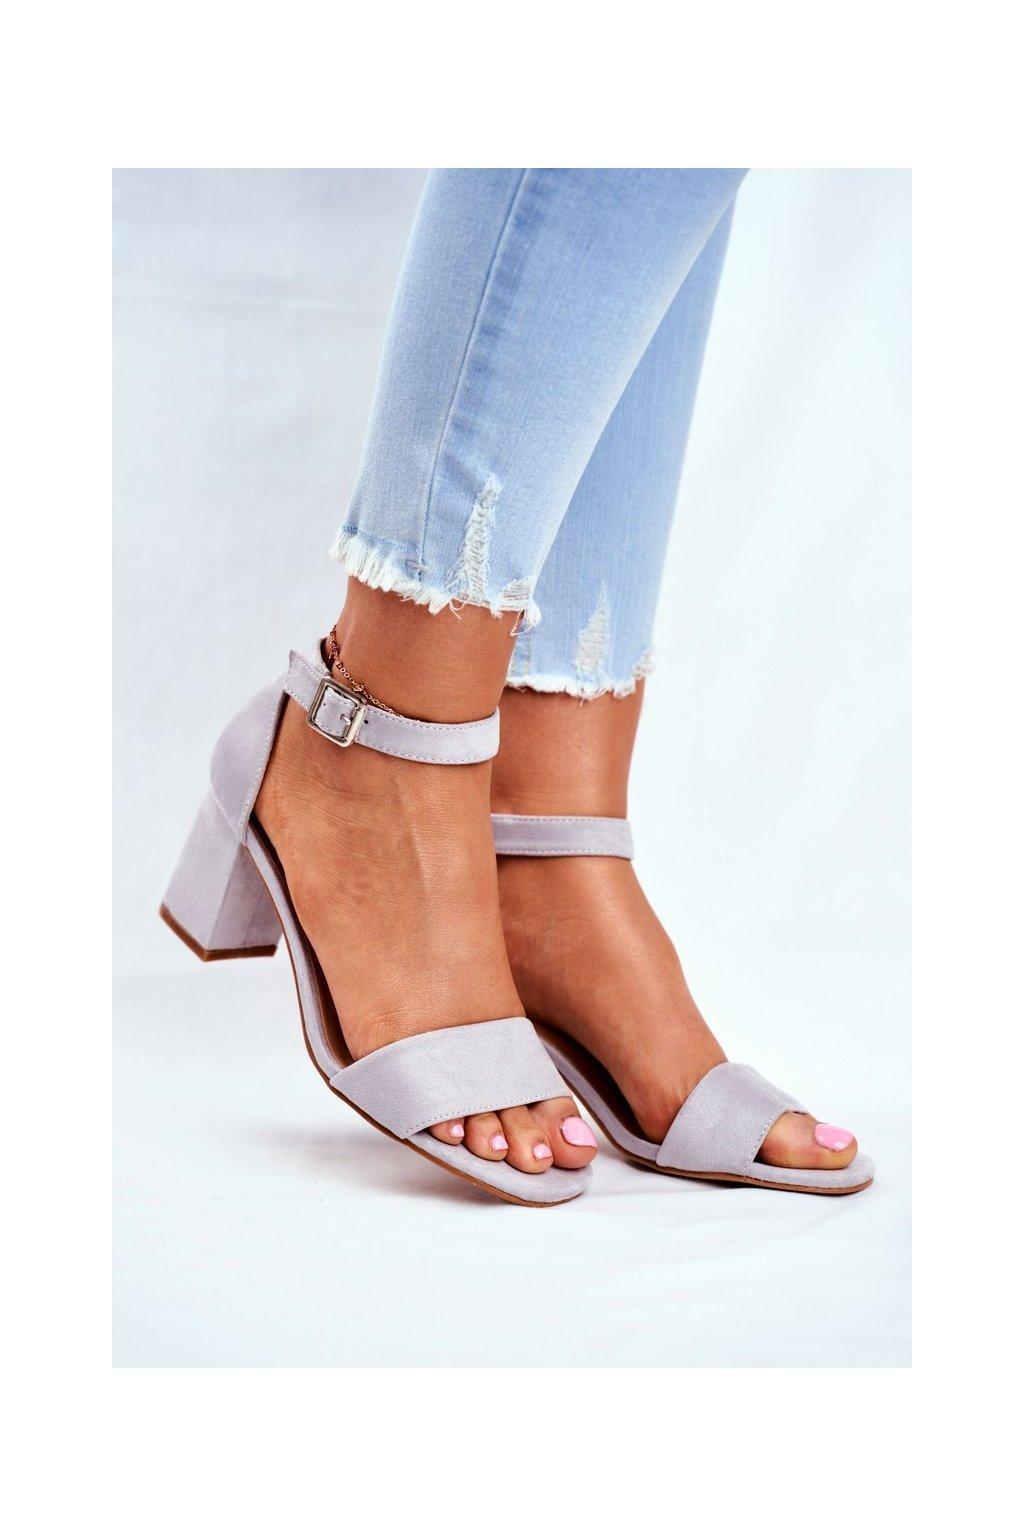 Dámske sandále na podpätku farba sivá kód obuvi 20-17058 GREY